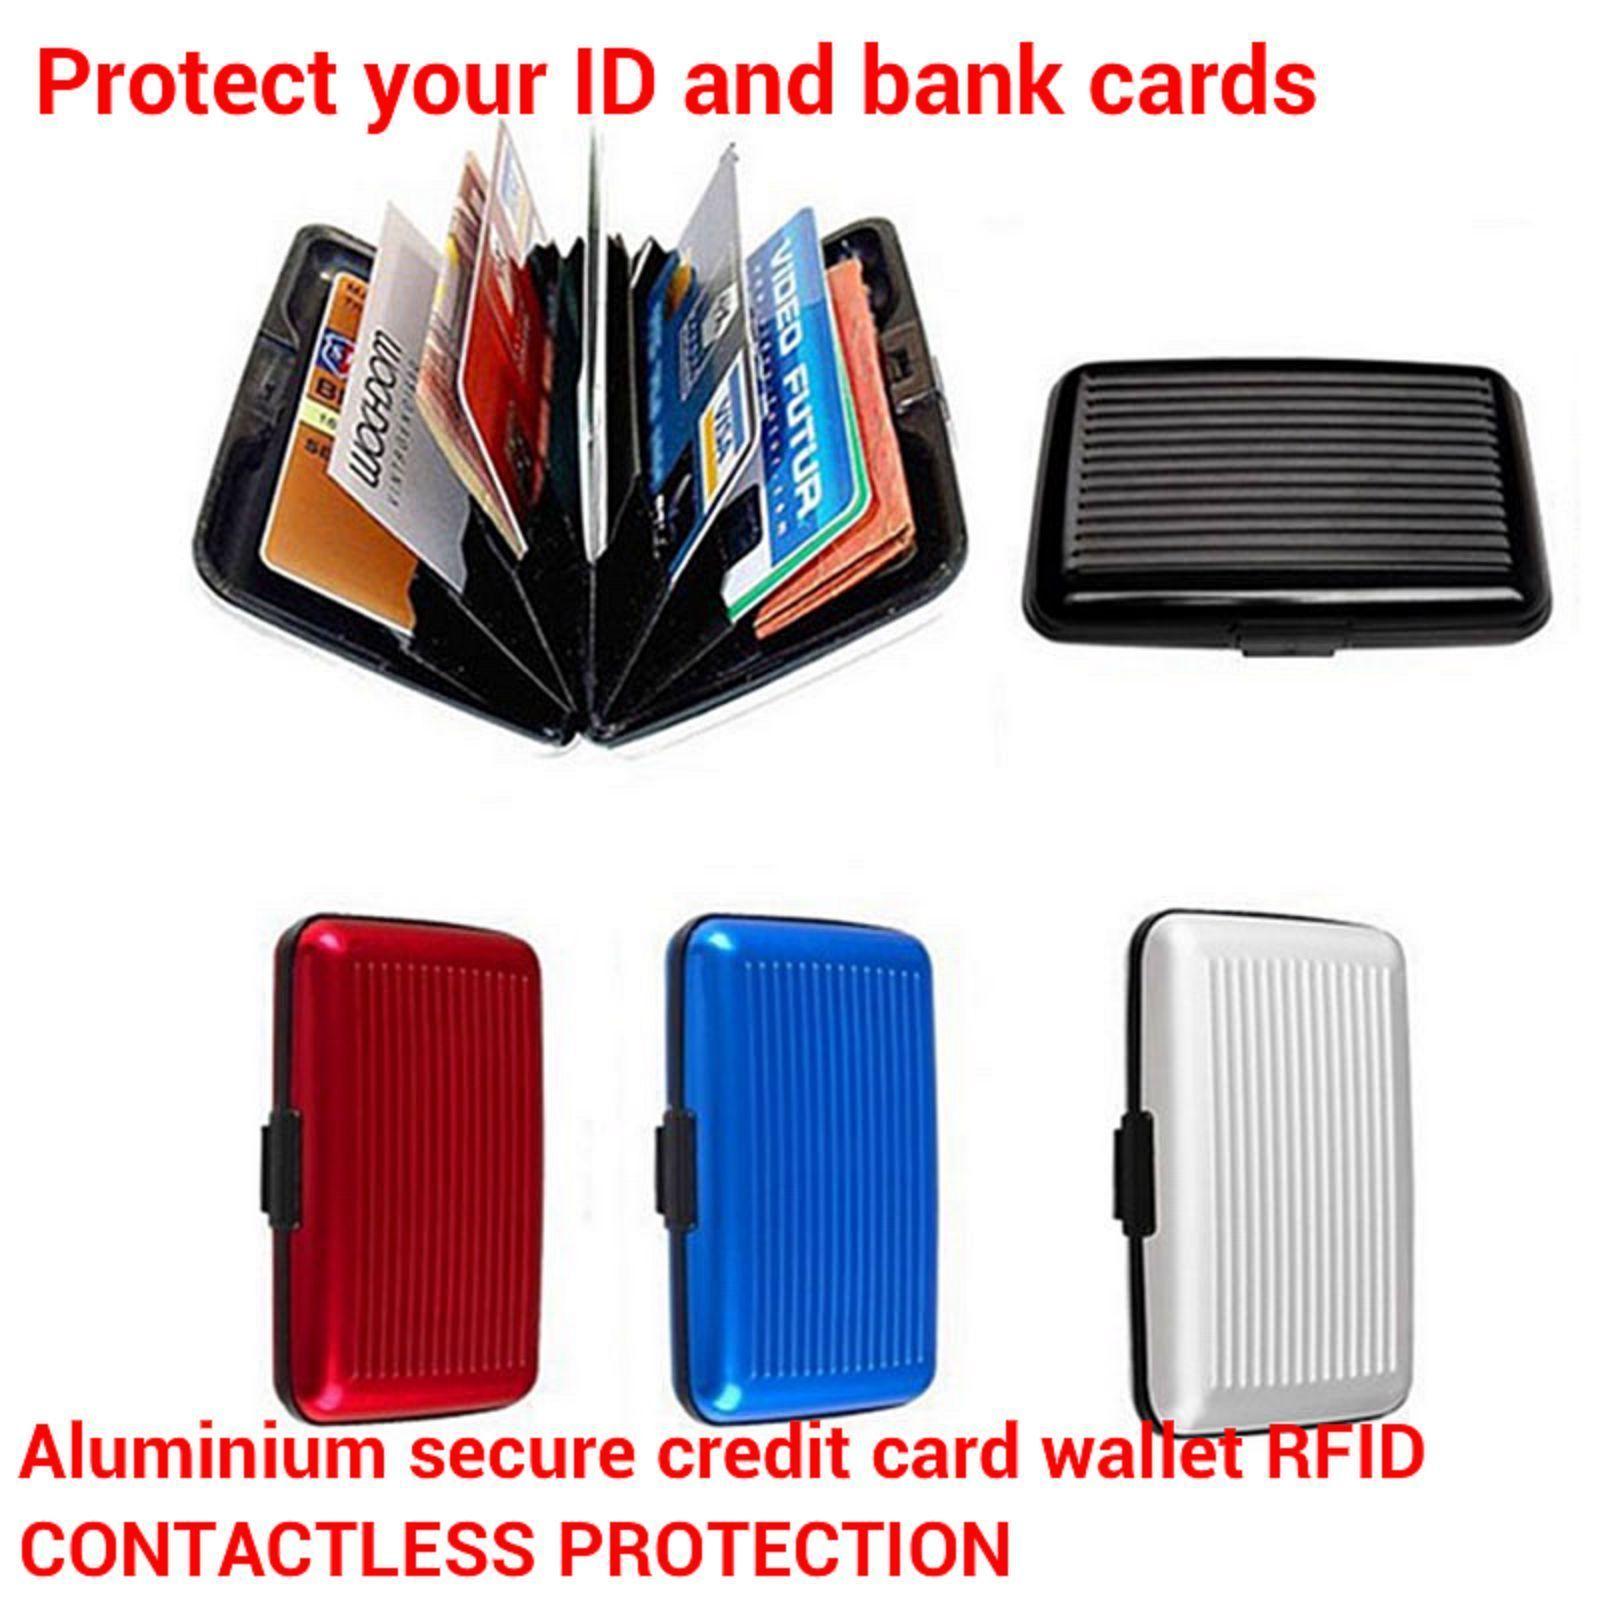 detailing b62d8 9c840 Aluminium Metal RFID Wallet Case Contactless and 50 similar items